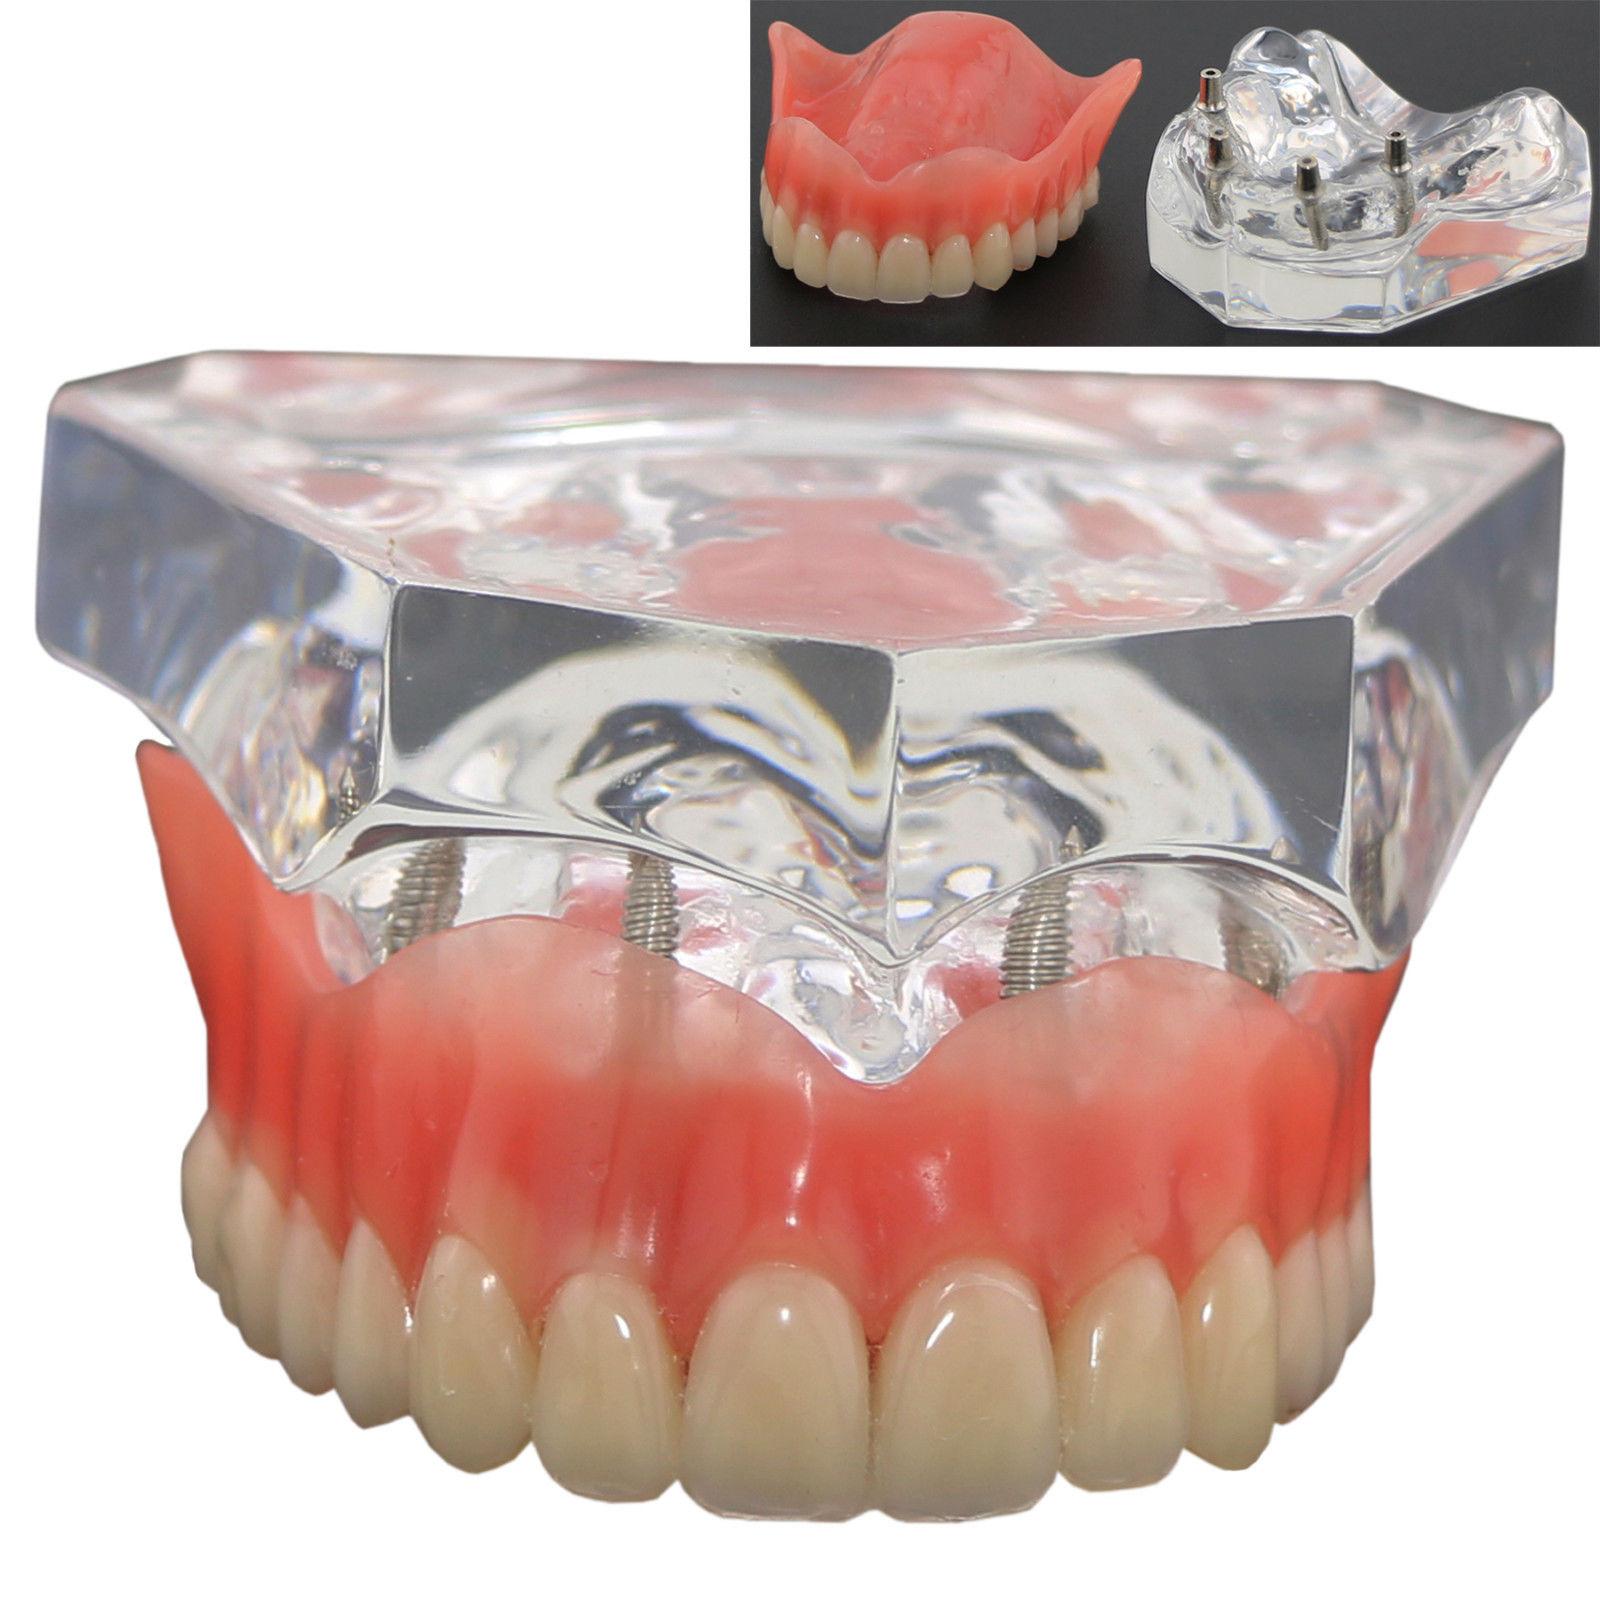 Dental Upper Teeth Model Overdenture Superior 4 Implants Demo Model 6001 02 teeth model blue dental orthodontics communication model with 4 types of brackets